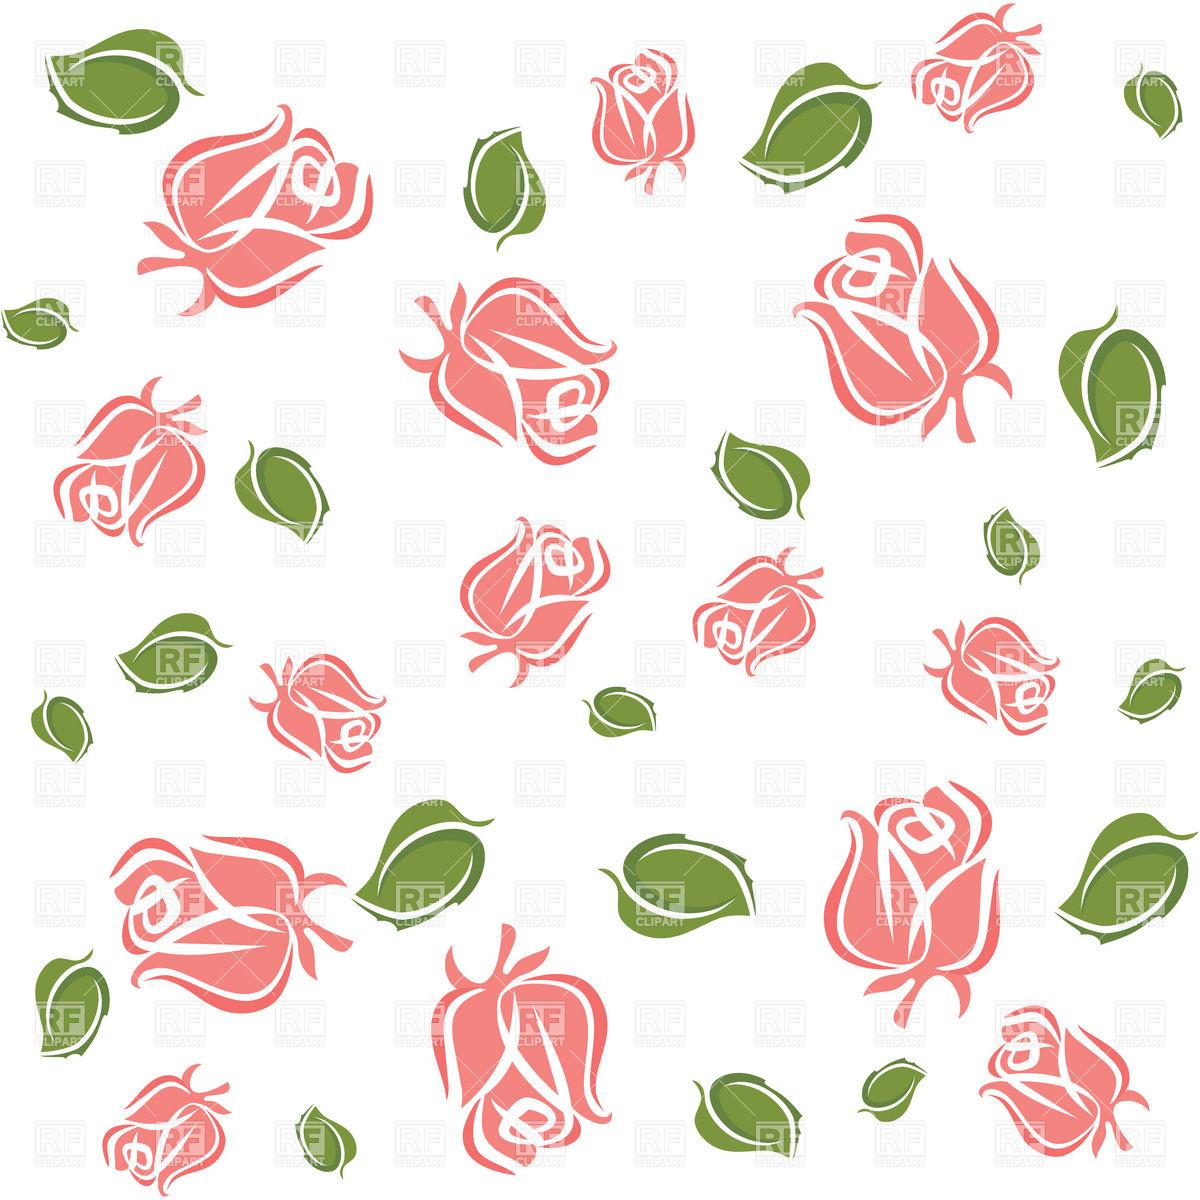 Wallpaper clipart Rose Clipart Rose Wallpaper Download